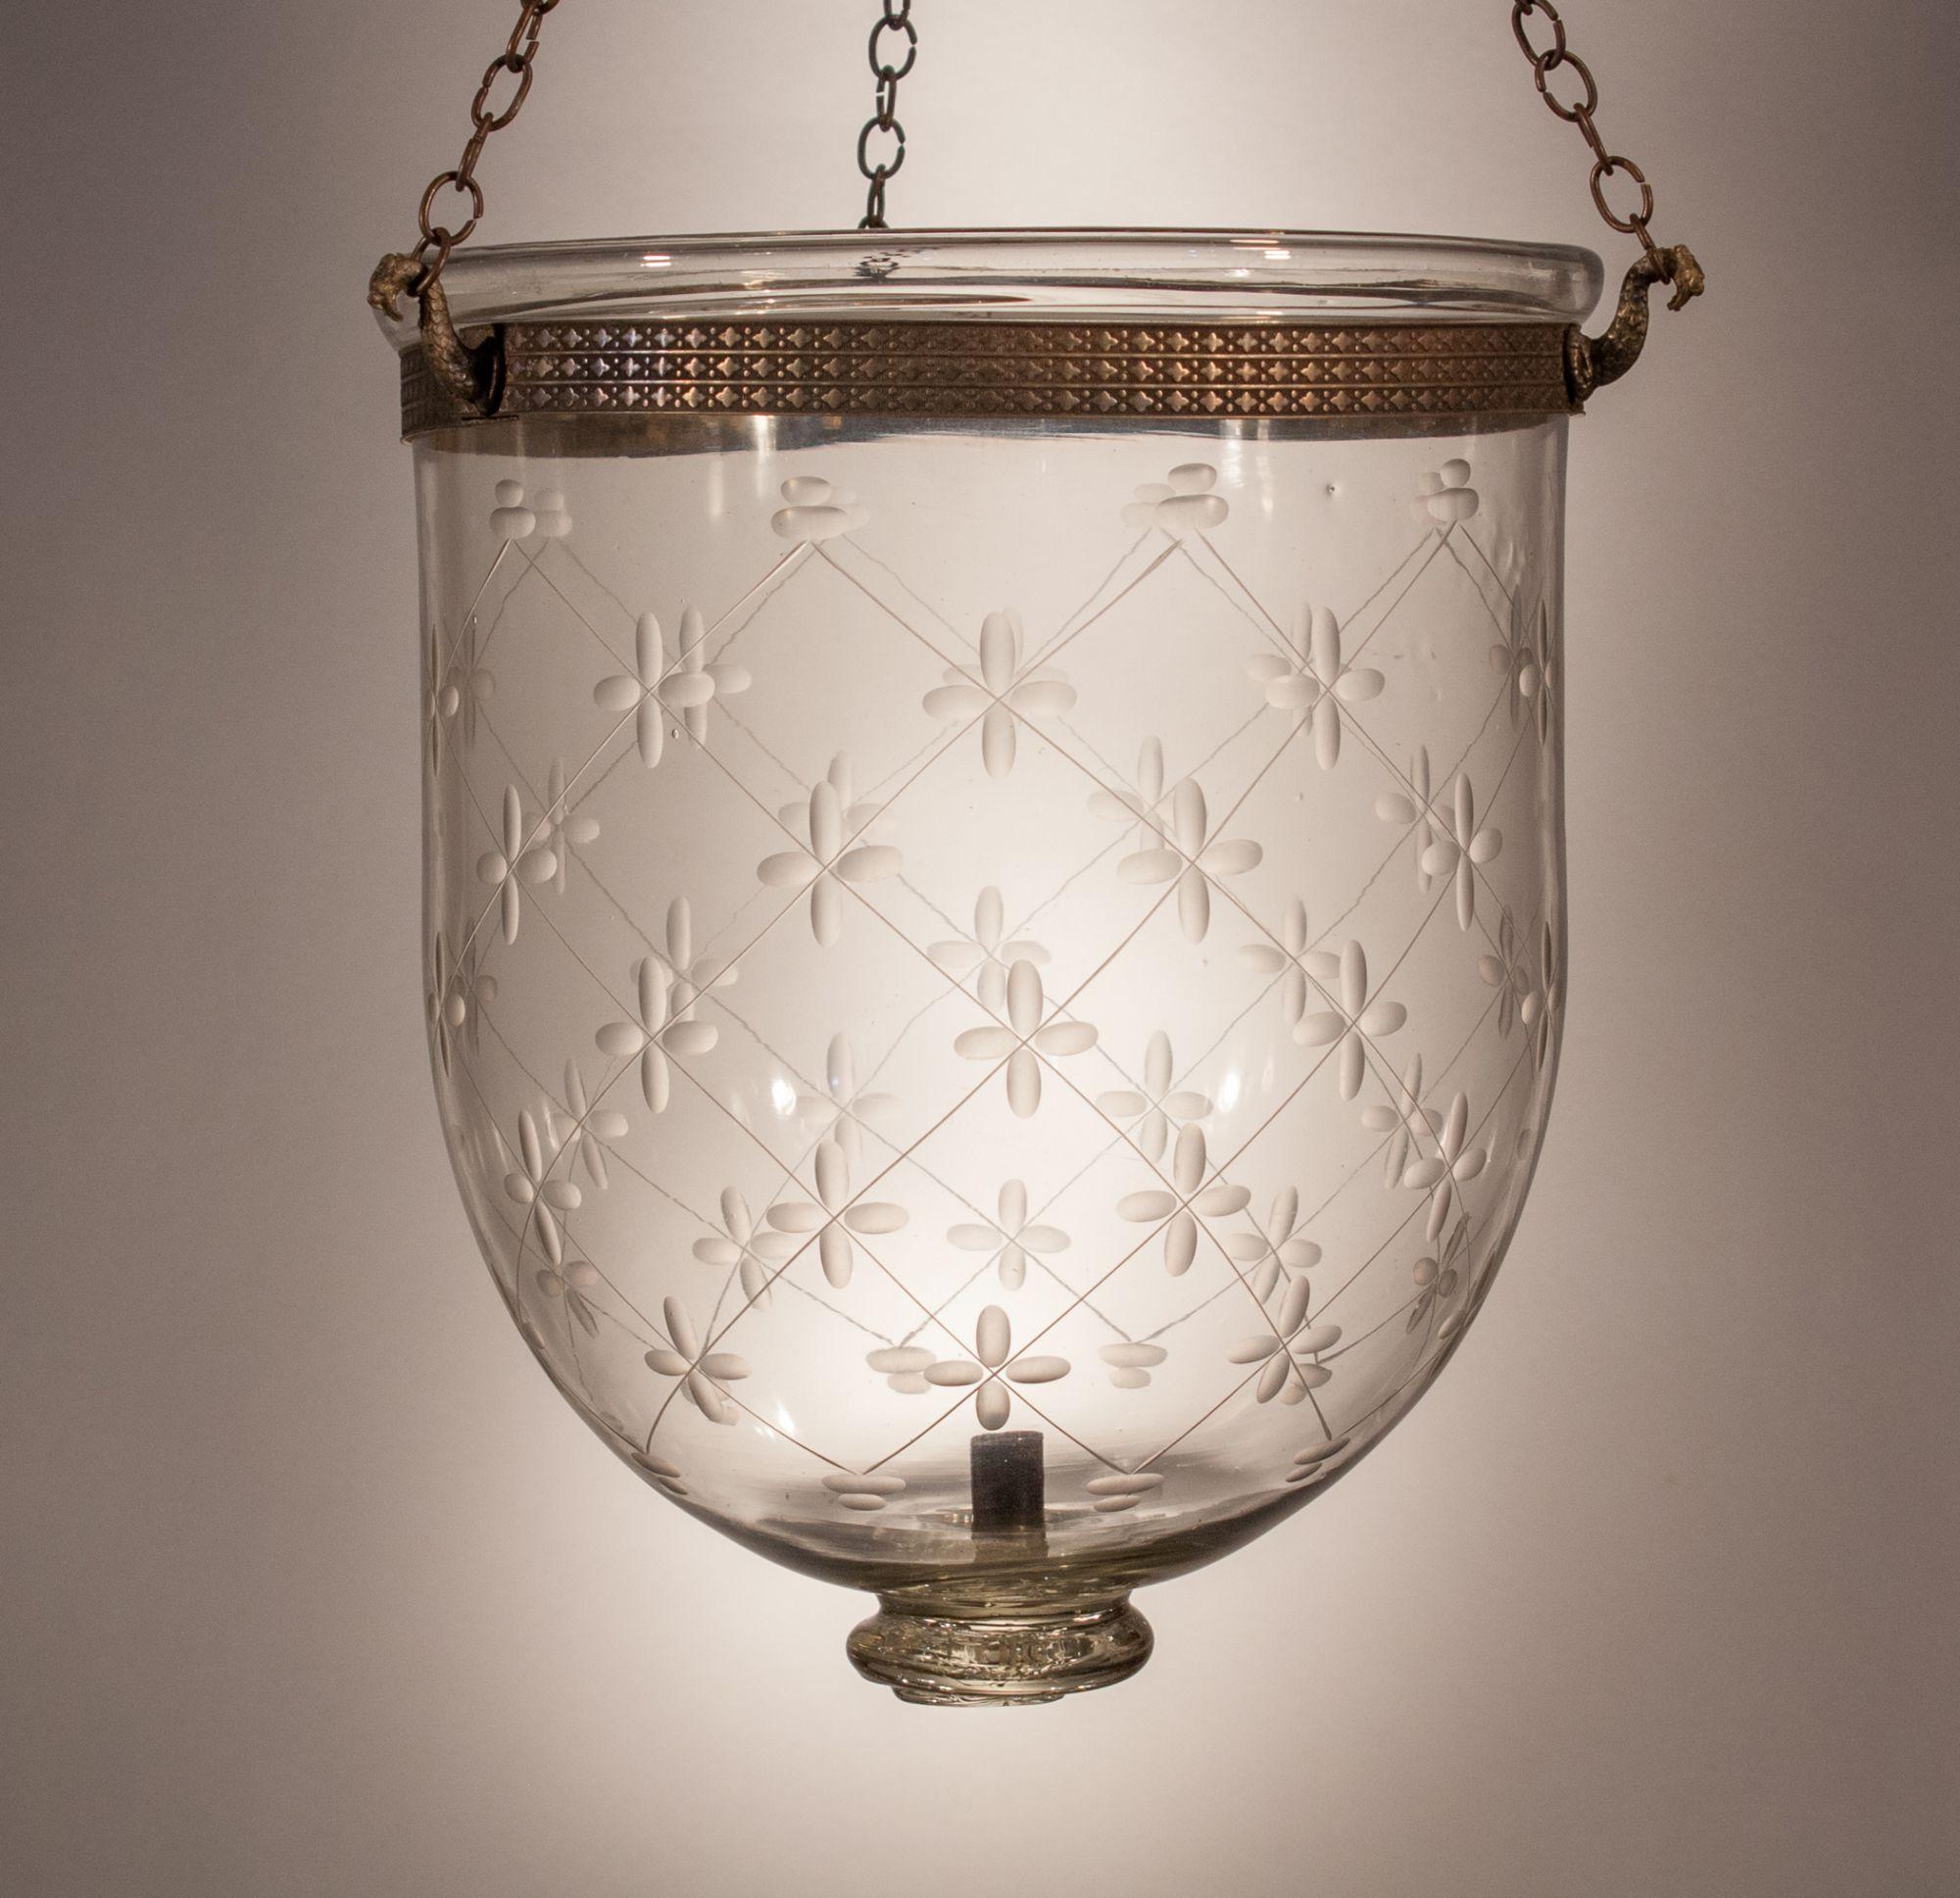 Antique English Glass Bell Jar Lantern With Trellis